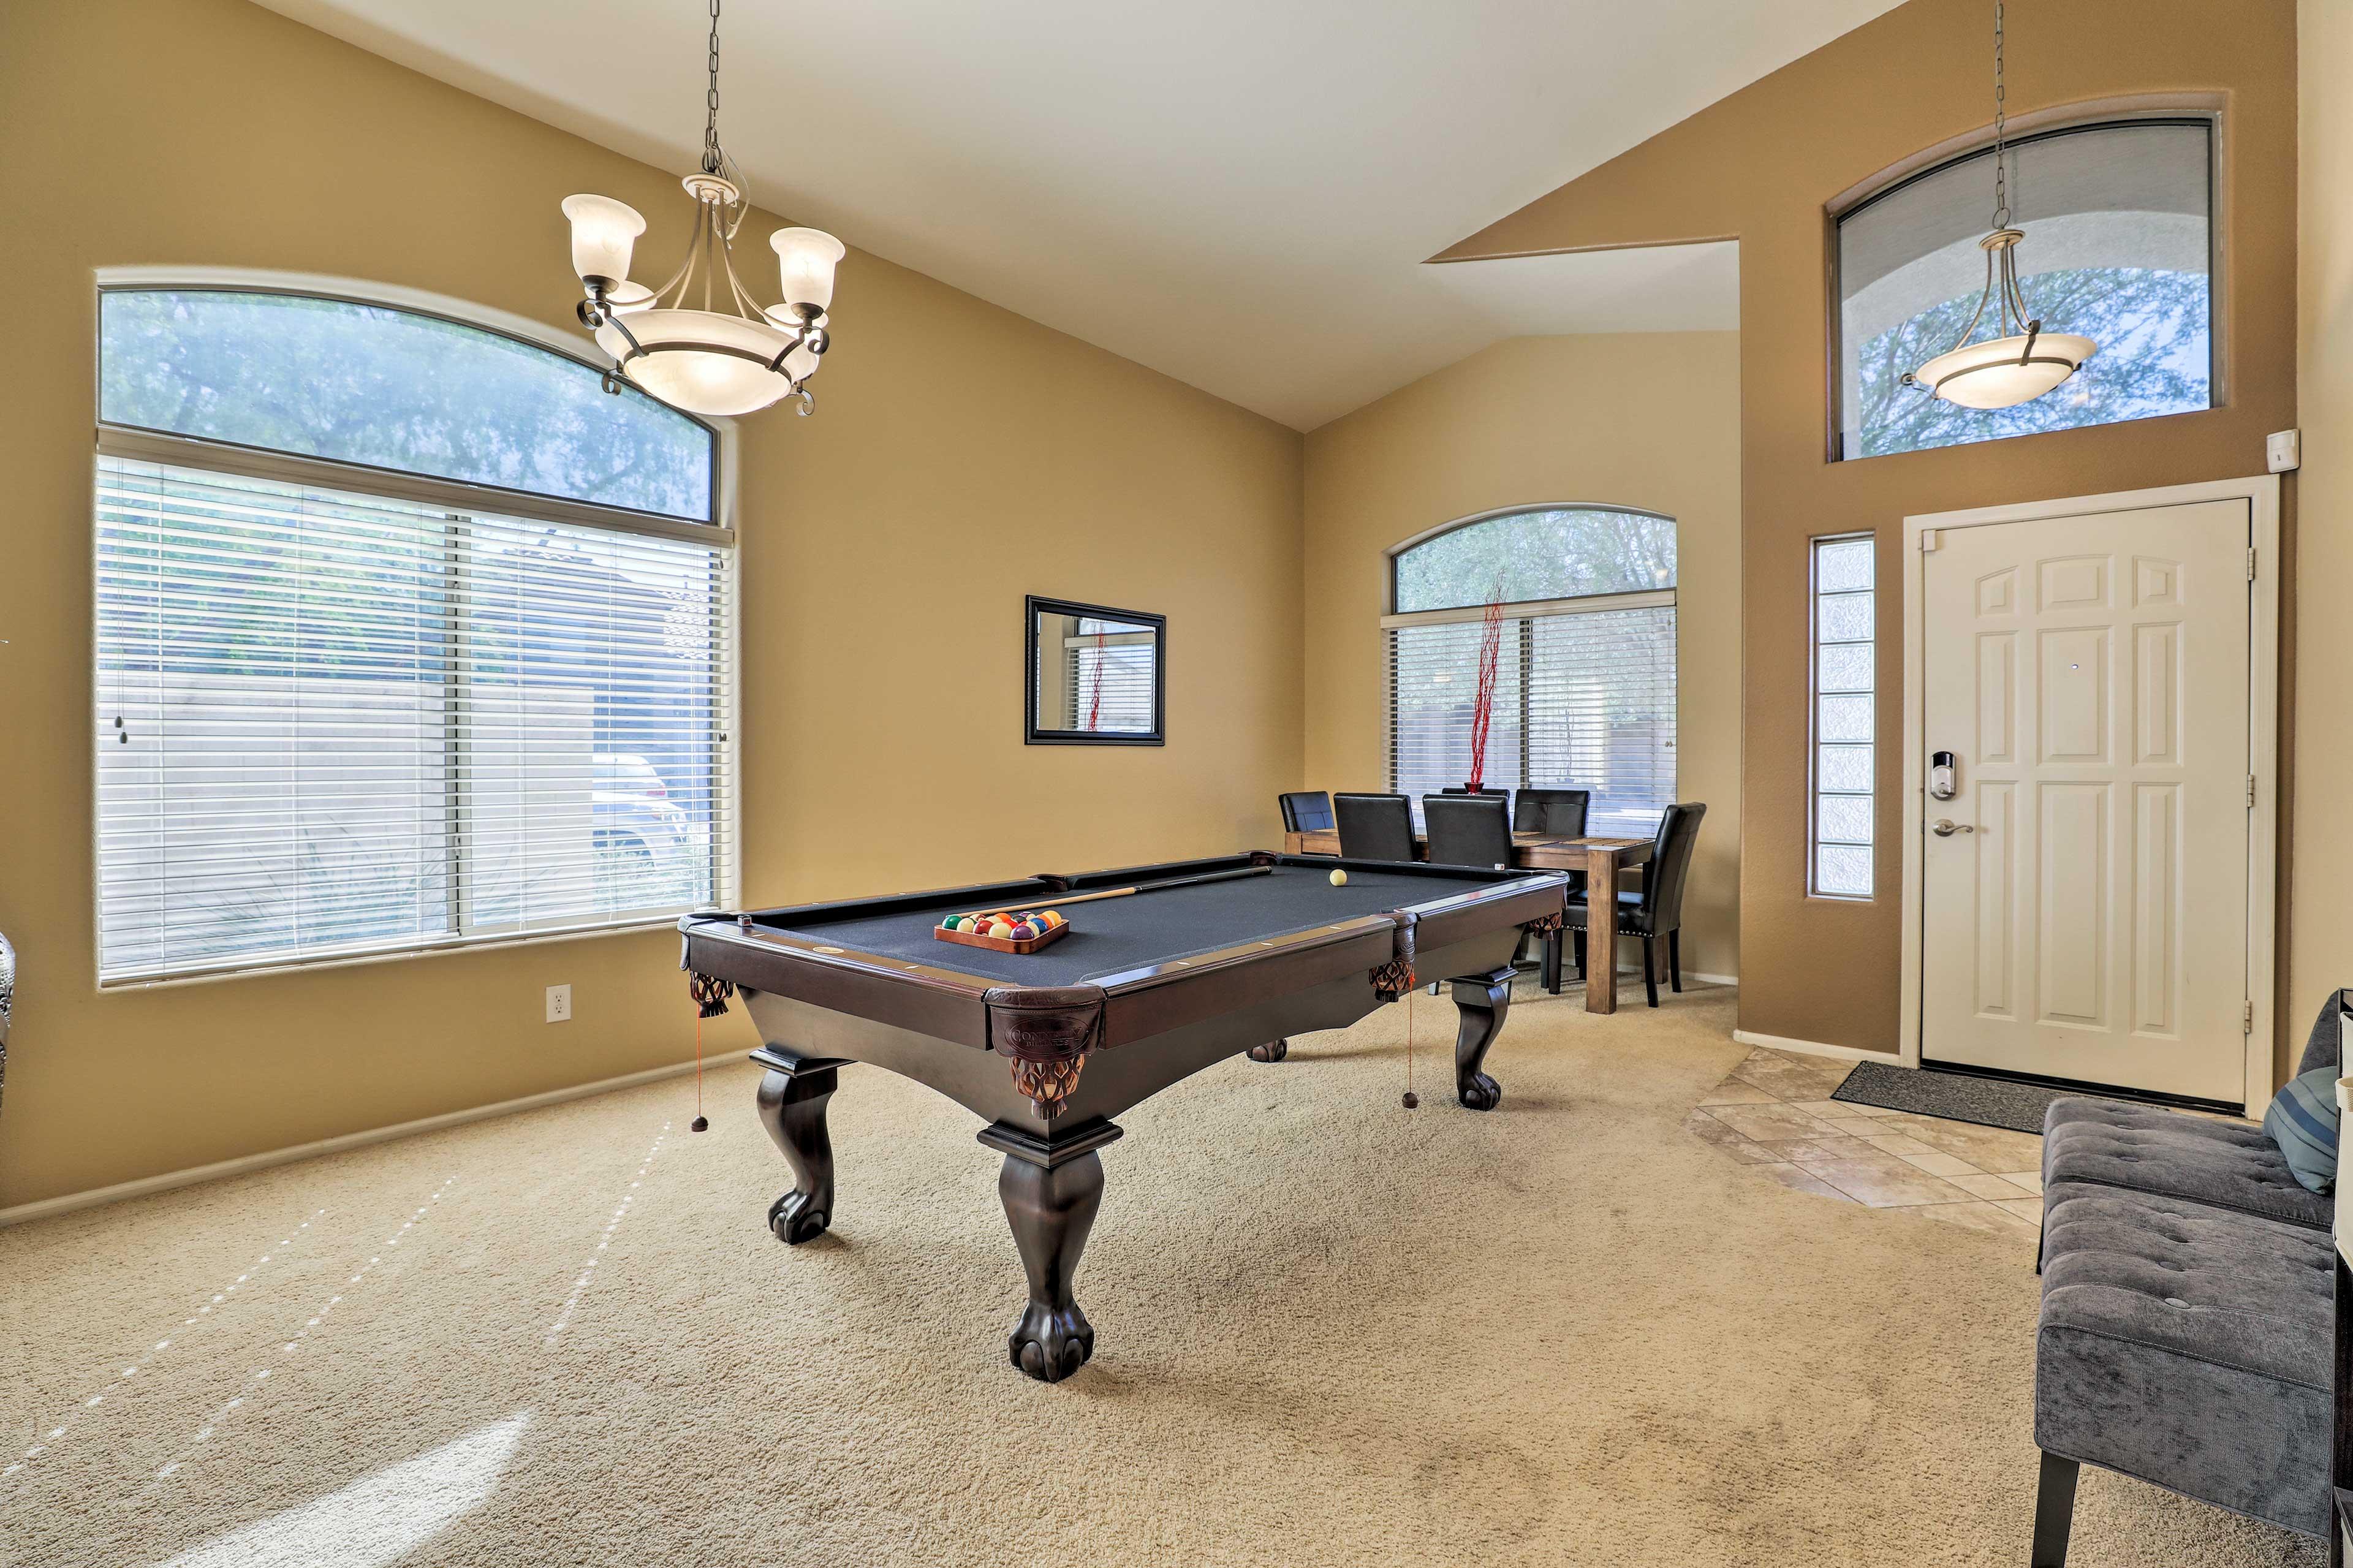 Interior   Pool Table